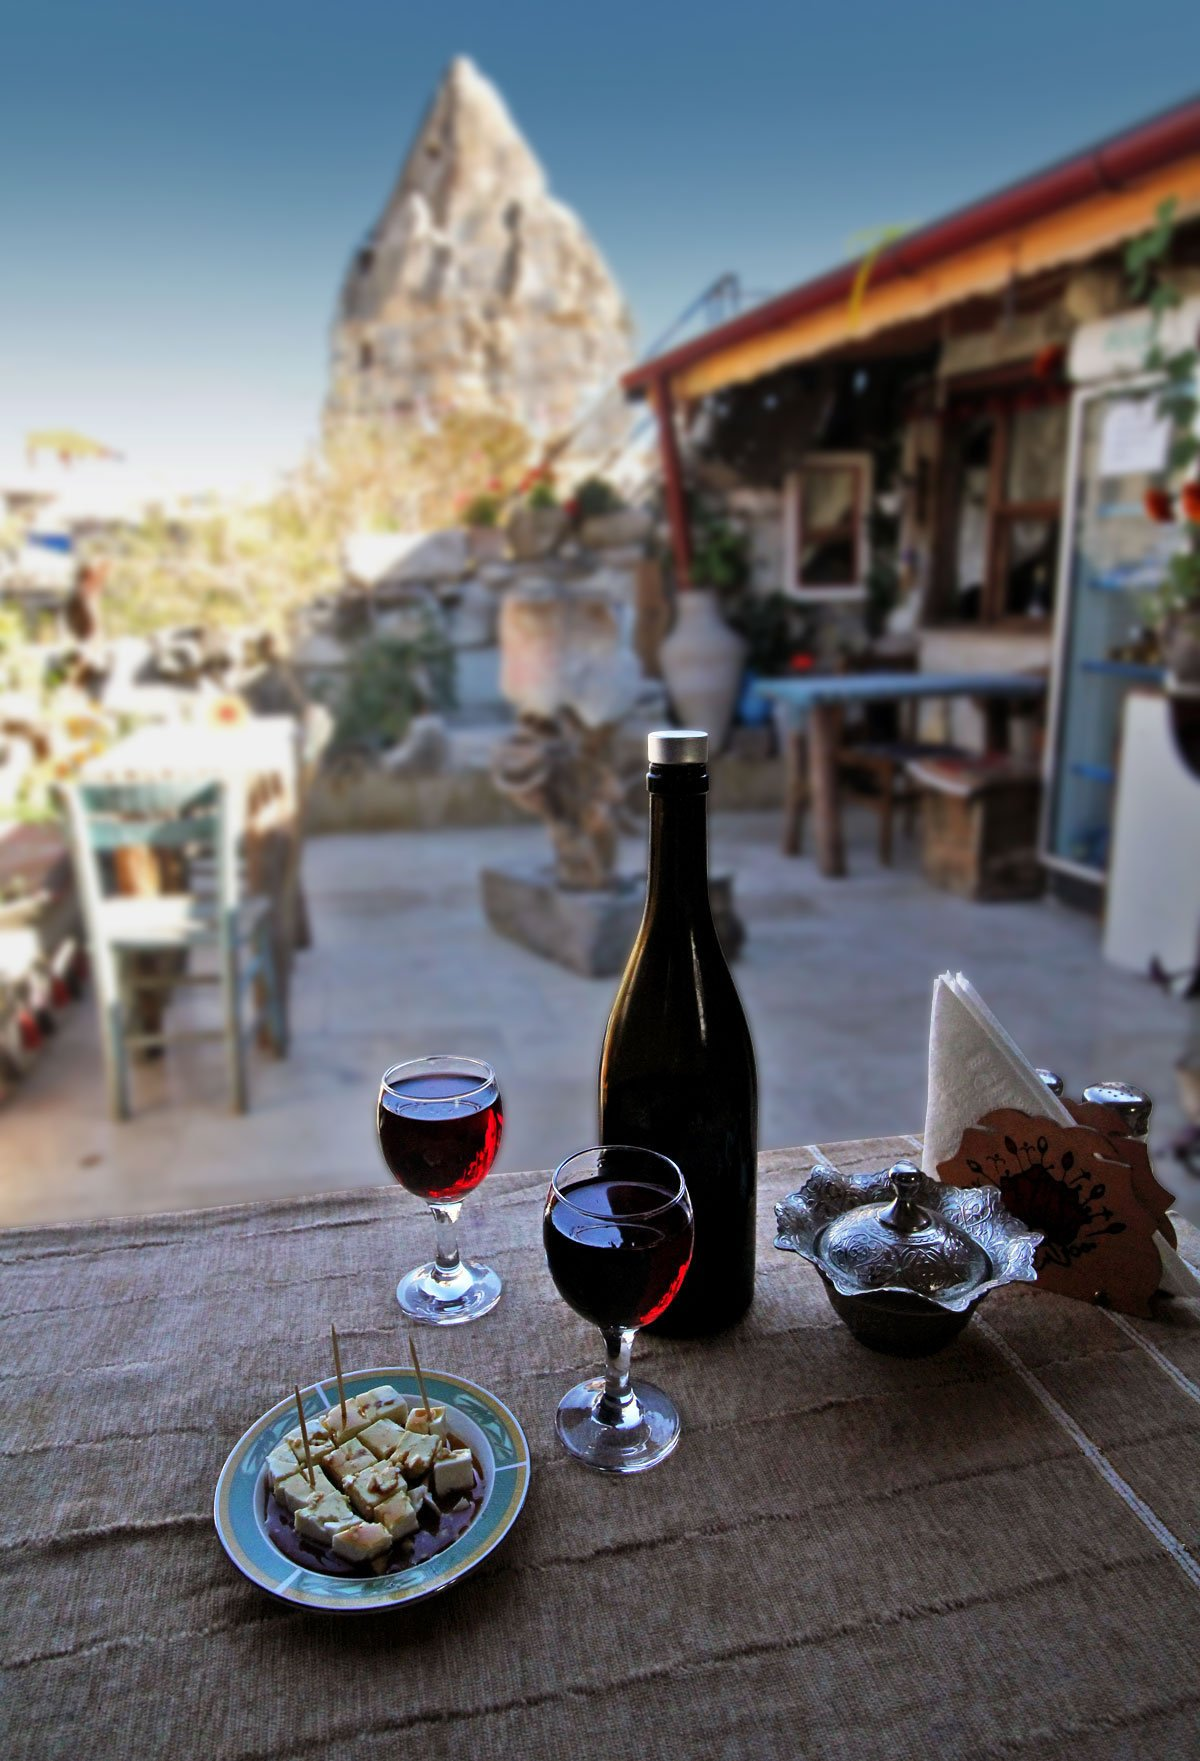 Omurca Art Cave Cafe: Where to Eat in Göreme, Cappadocia, Turkey